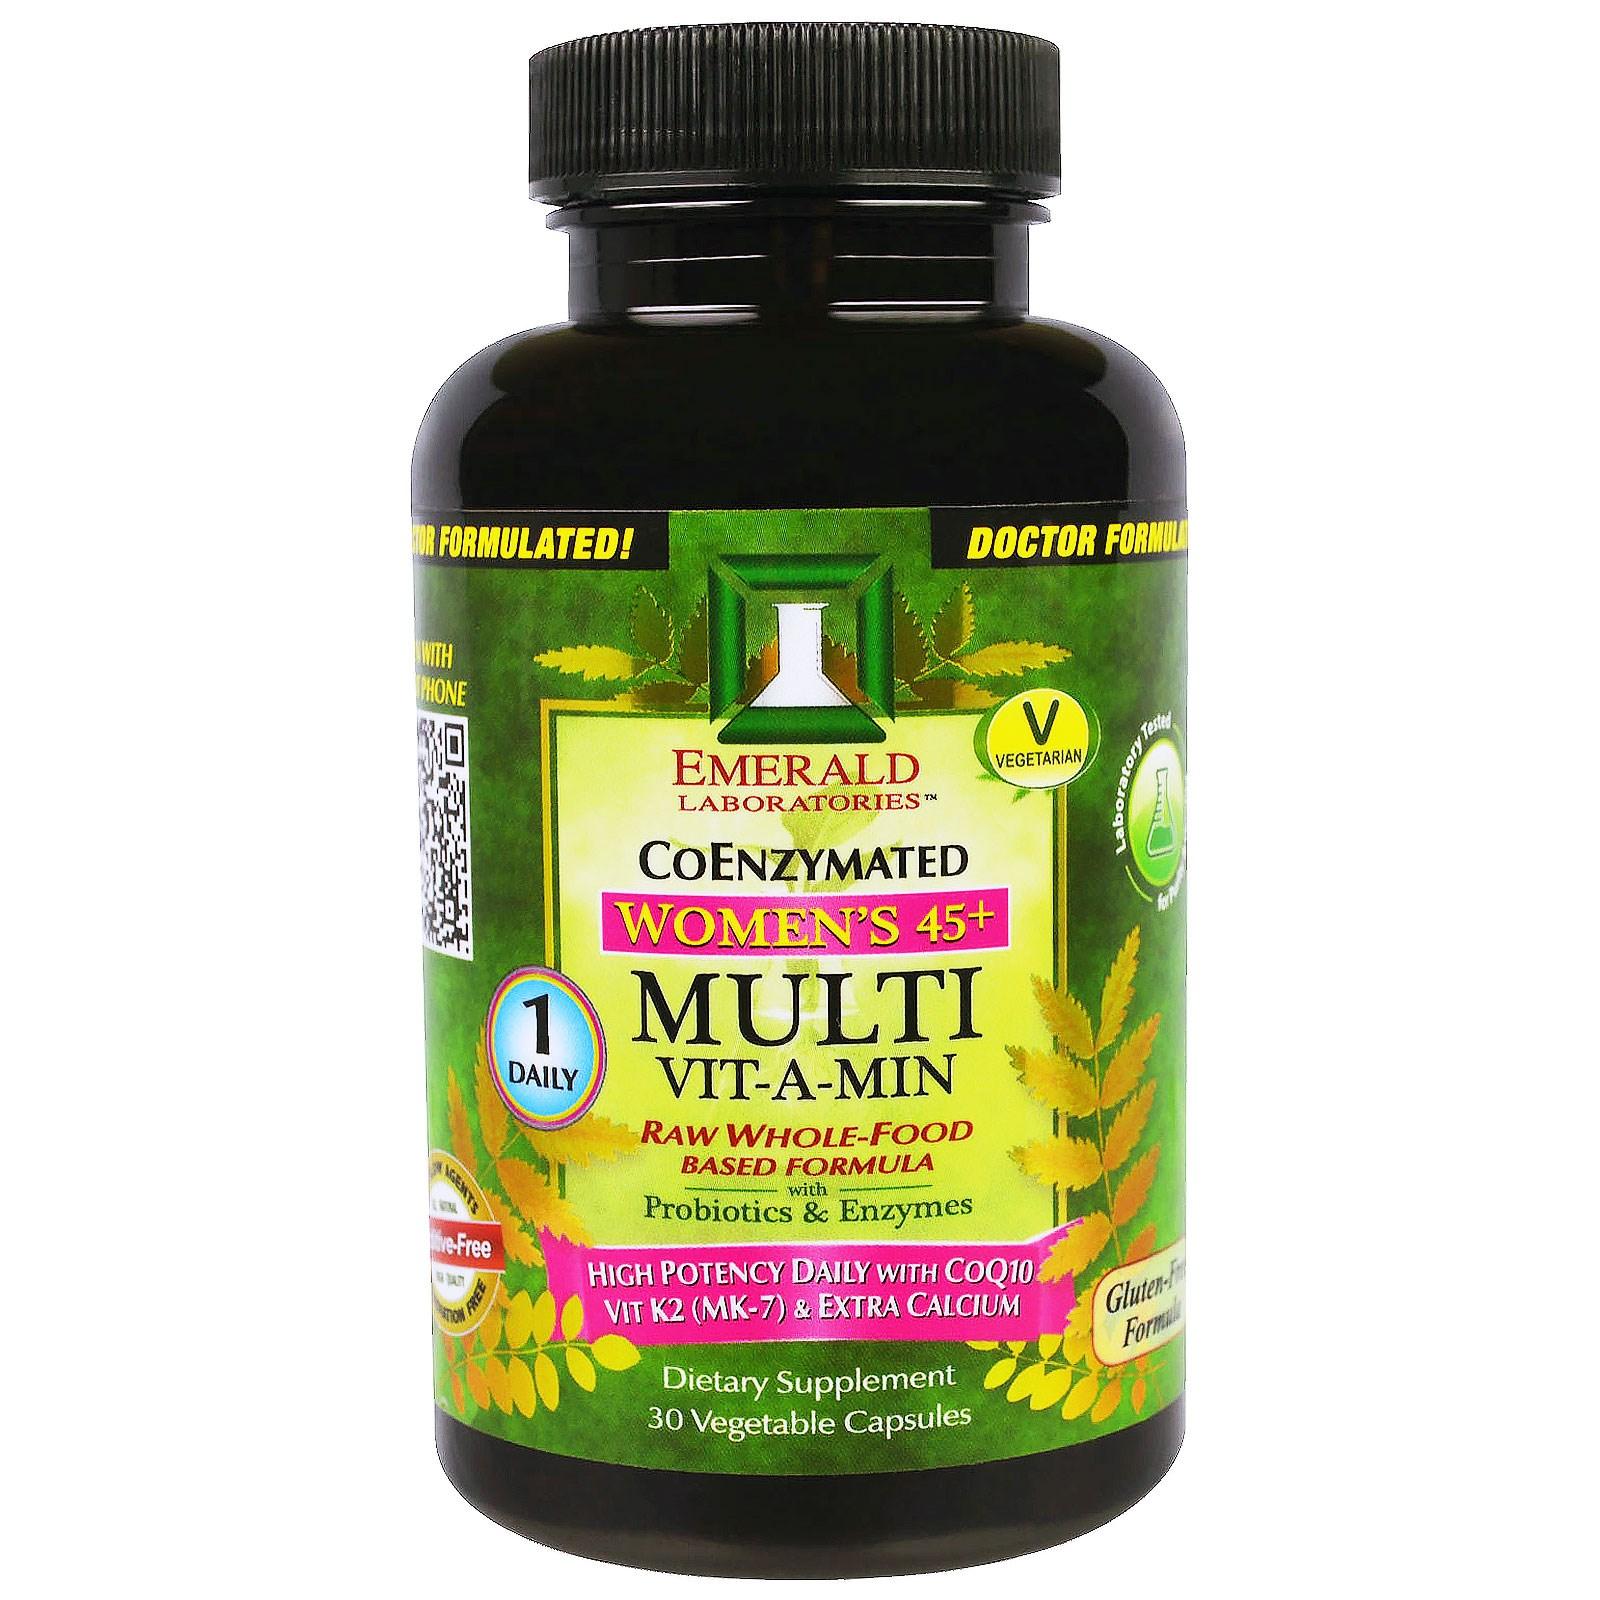 Emerald Laboratories, CoEnzymated, Multi Vit-A-Min, мультивитамины для женщин 45+, с коэнзимами 30 вегетарианских капсул